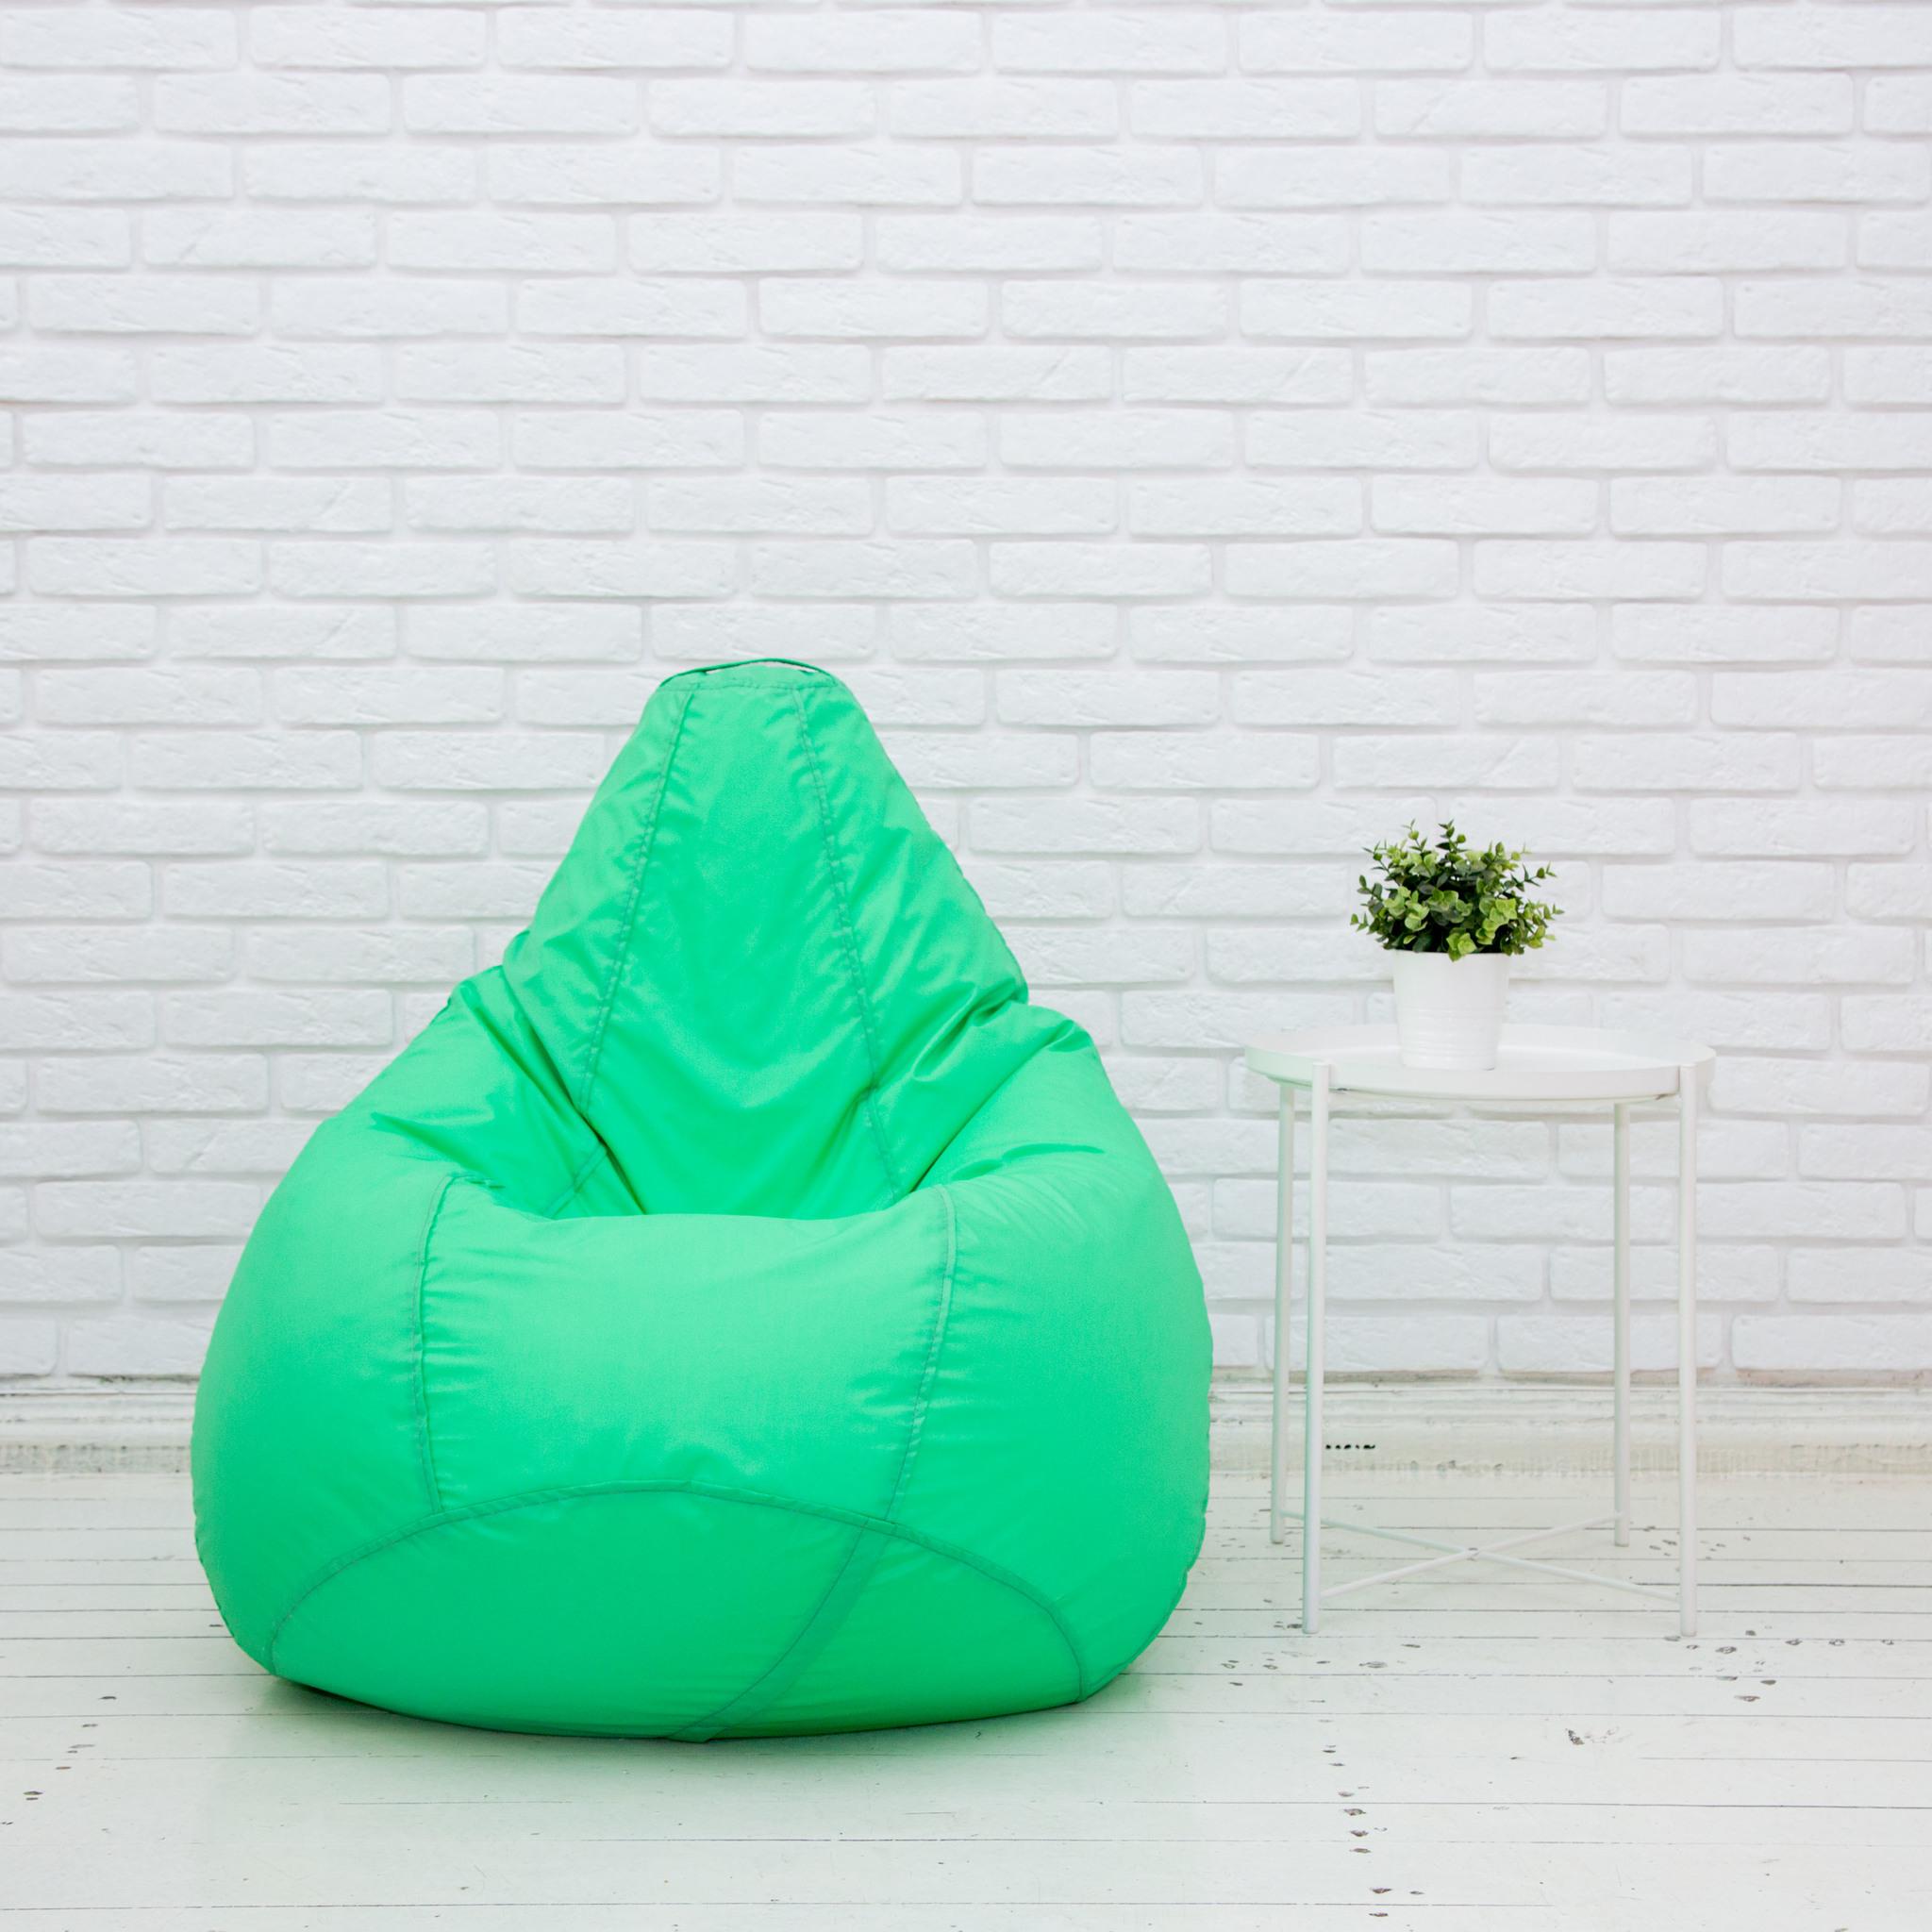 Груша М плащёвка, несъёмный чехол (зеленый)